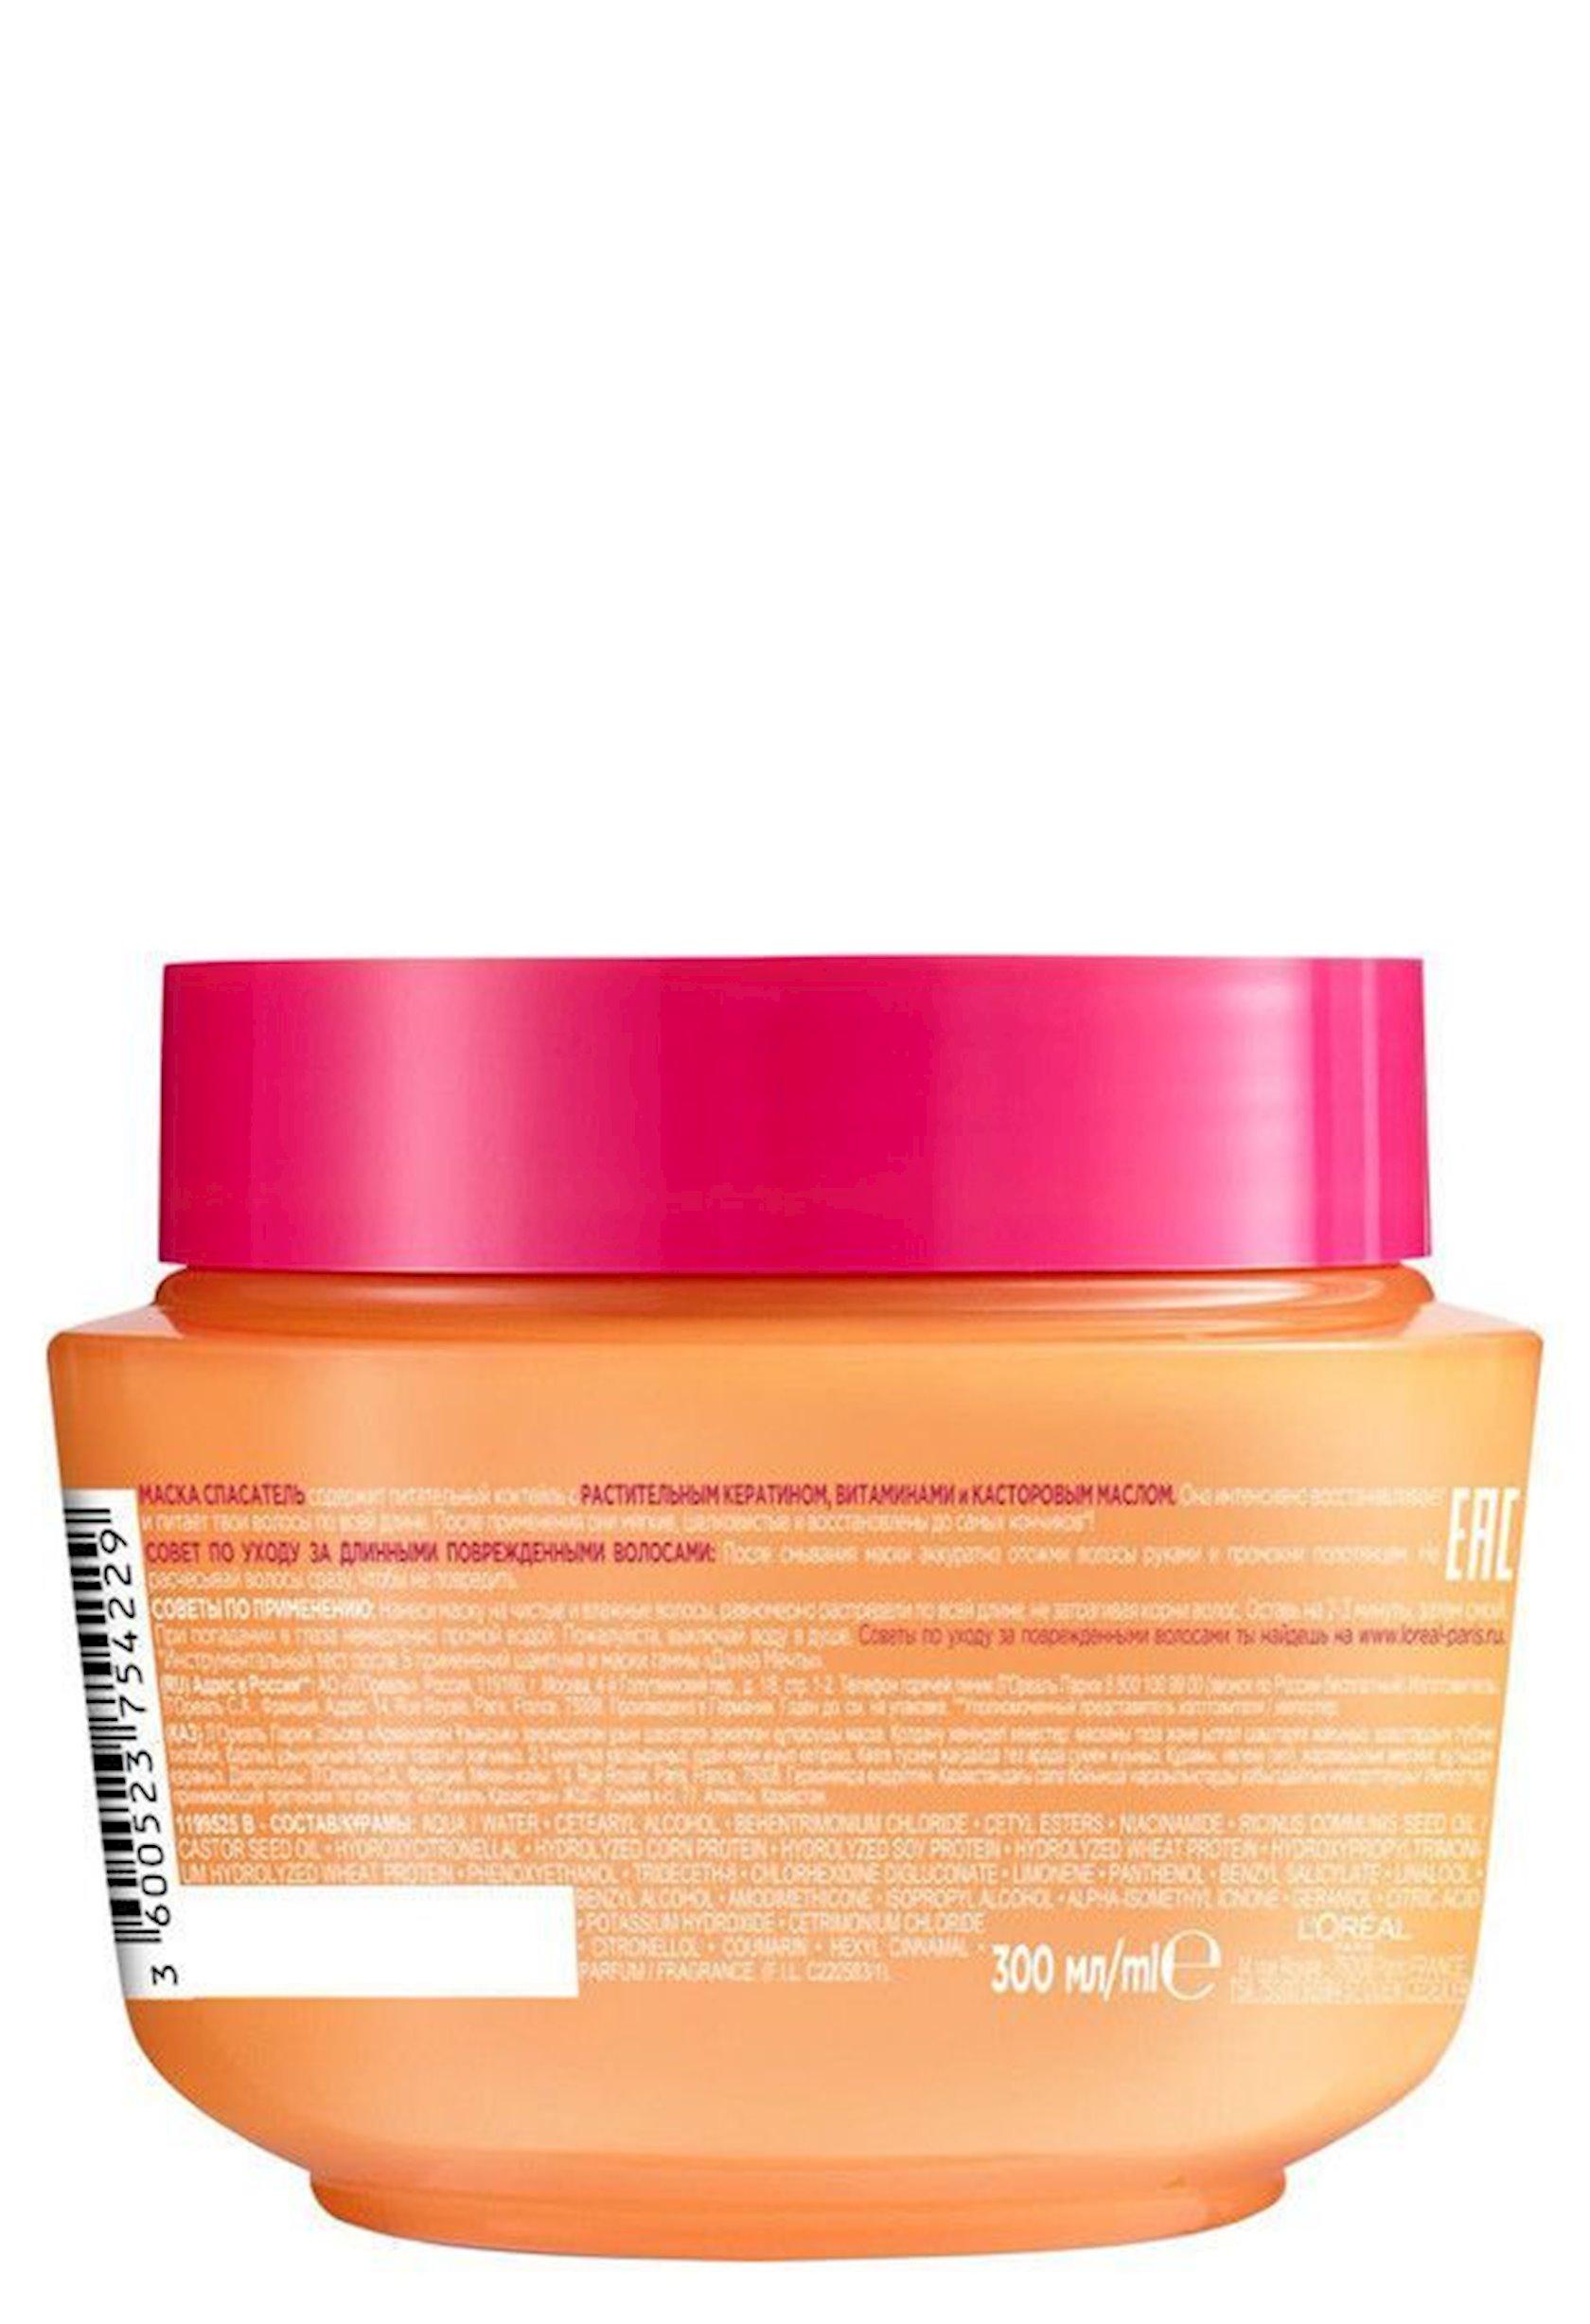 Saç üçün maska L'Oréal Paris Elseve Xəyallar uzunluğu, 300 ml